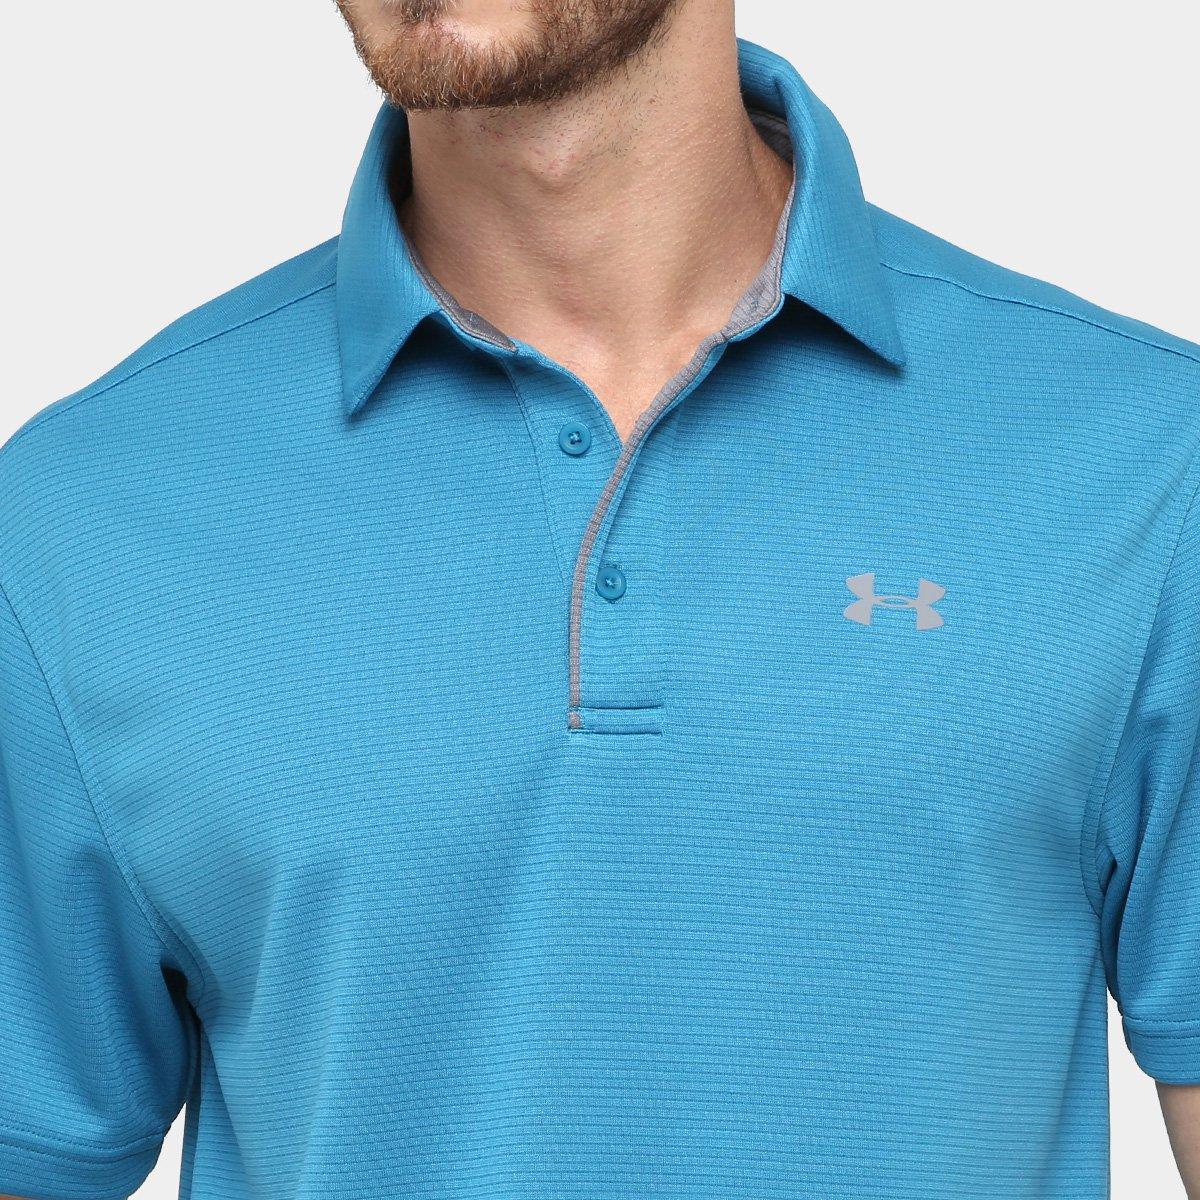 afa3ffc44f Camisa Polo Under Armour Tech Masculina - Azul e Cinza - Compre ...